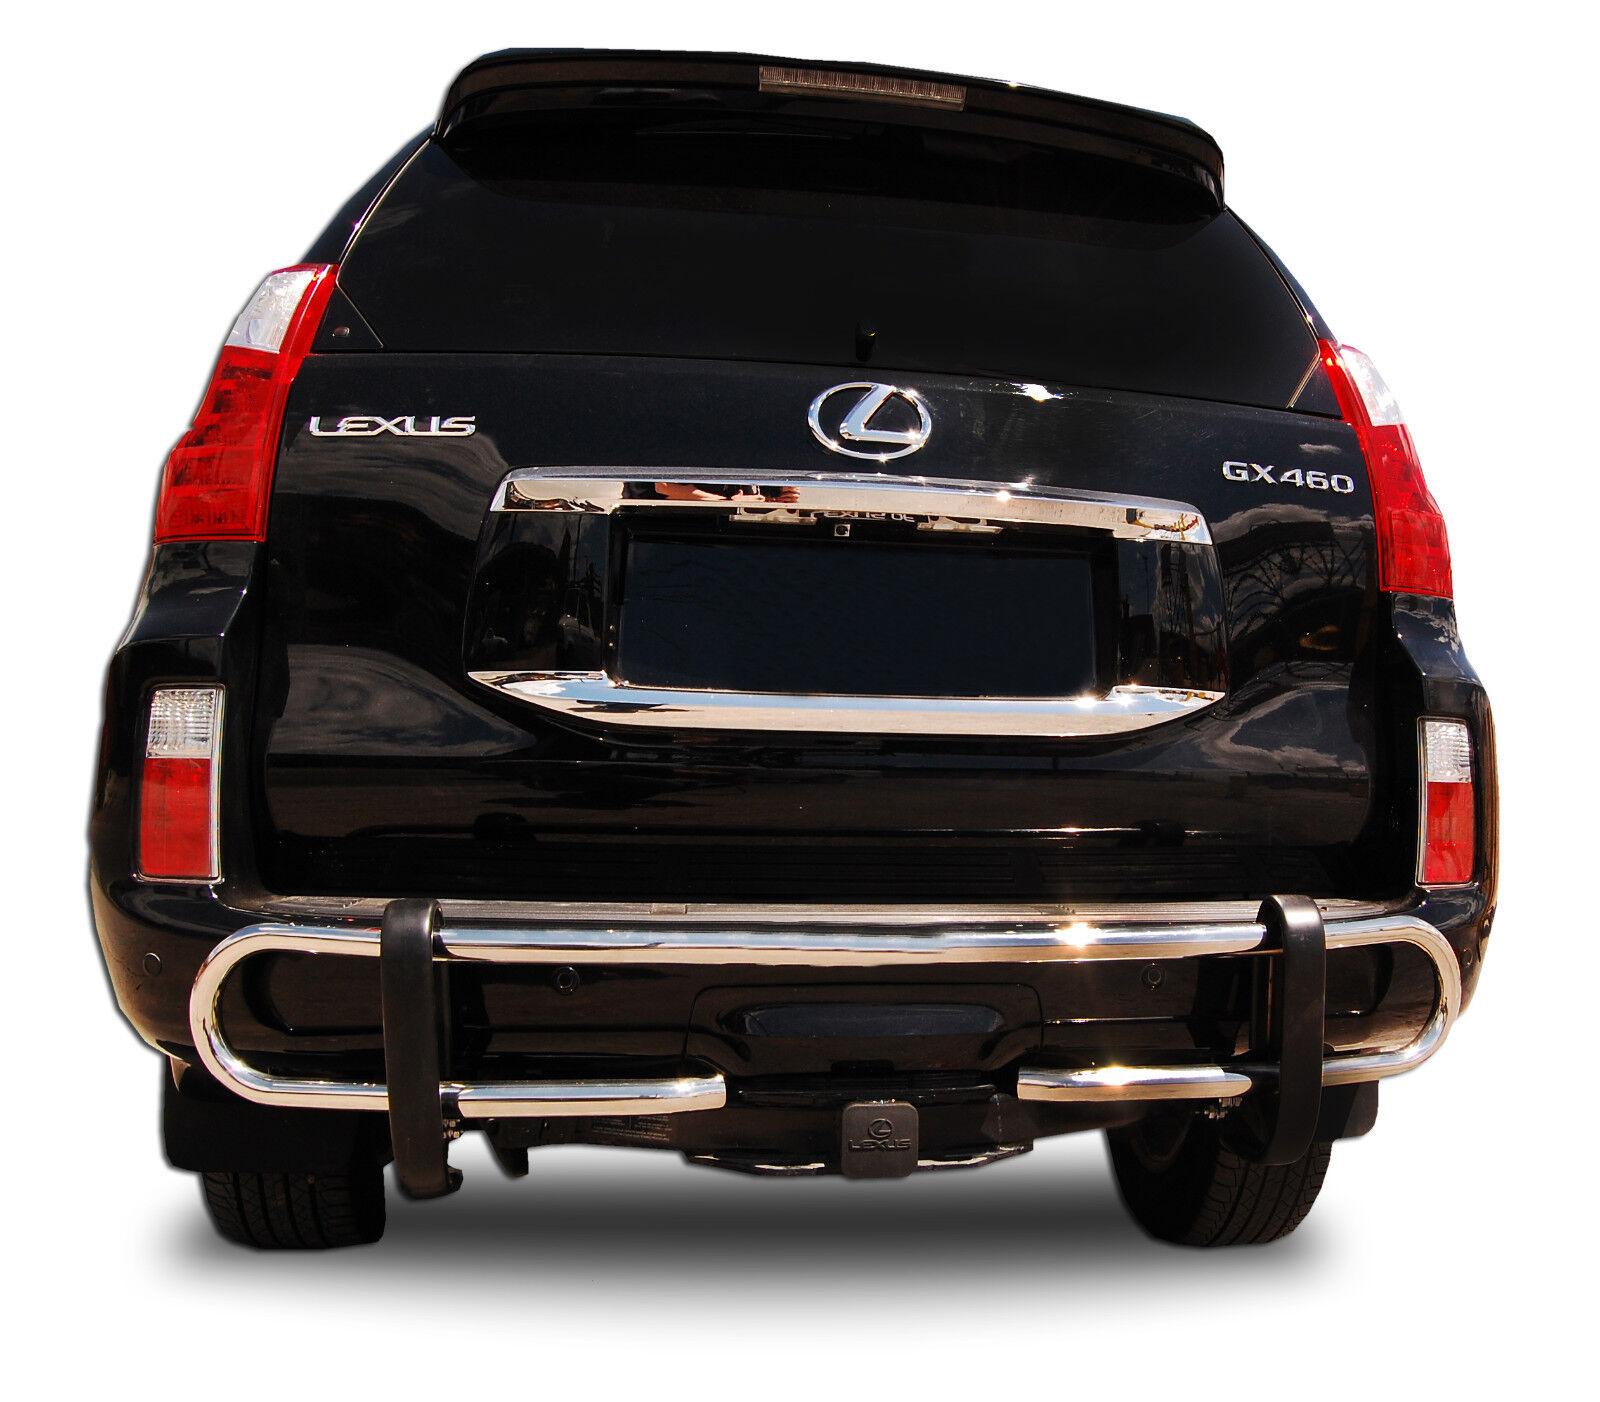 Wynntech S//S Rear Bumper Guard Double Pipe For 2010-2017 Toyota 4Runner